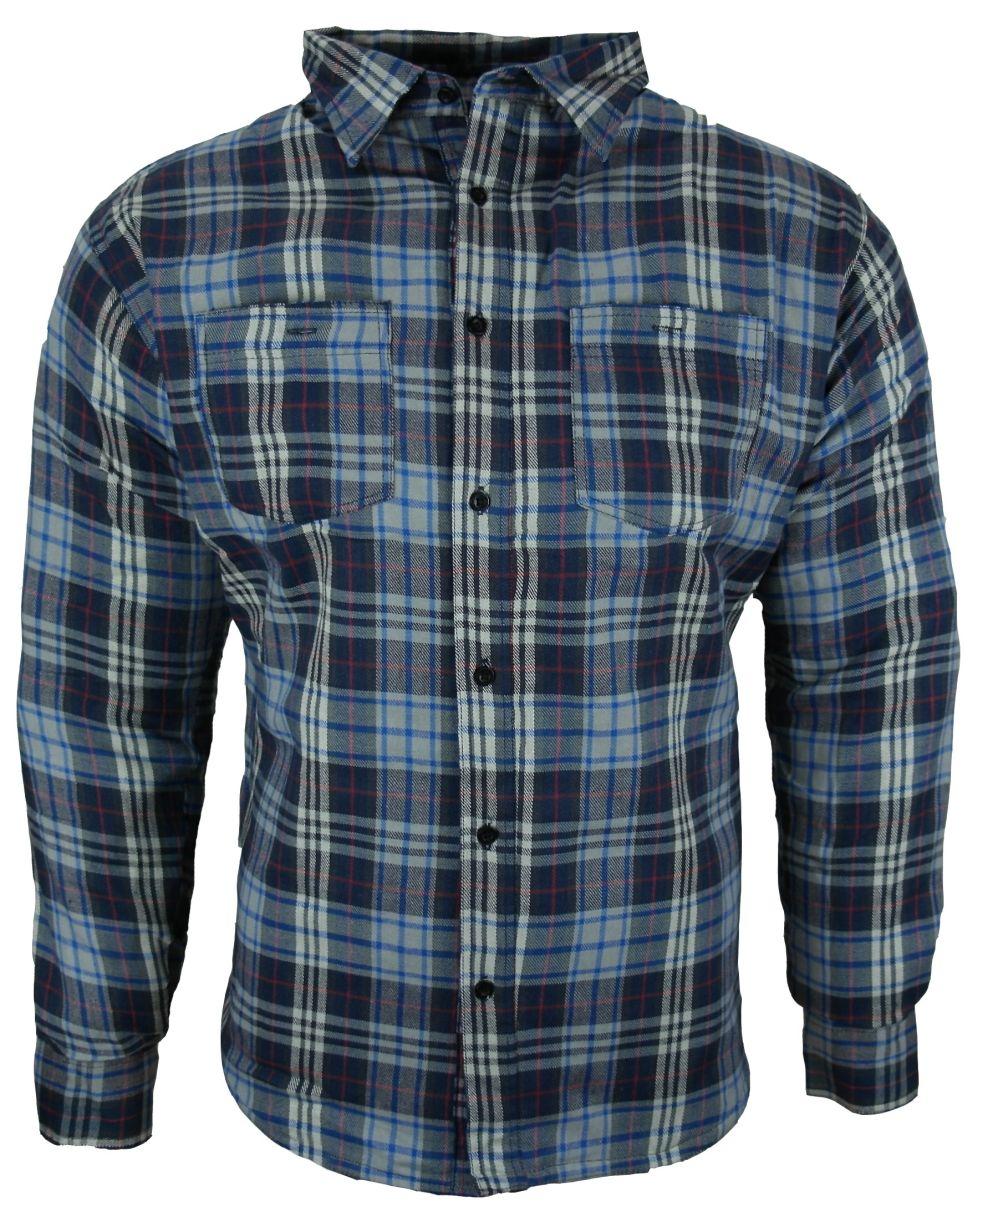 Heyberry Motorrad Biker Holzfäller Hemd Shirt Aramid blau grau M - 3XL